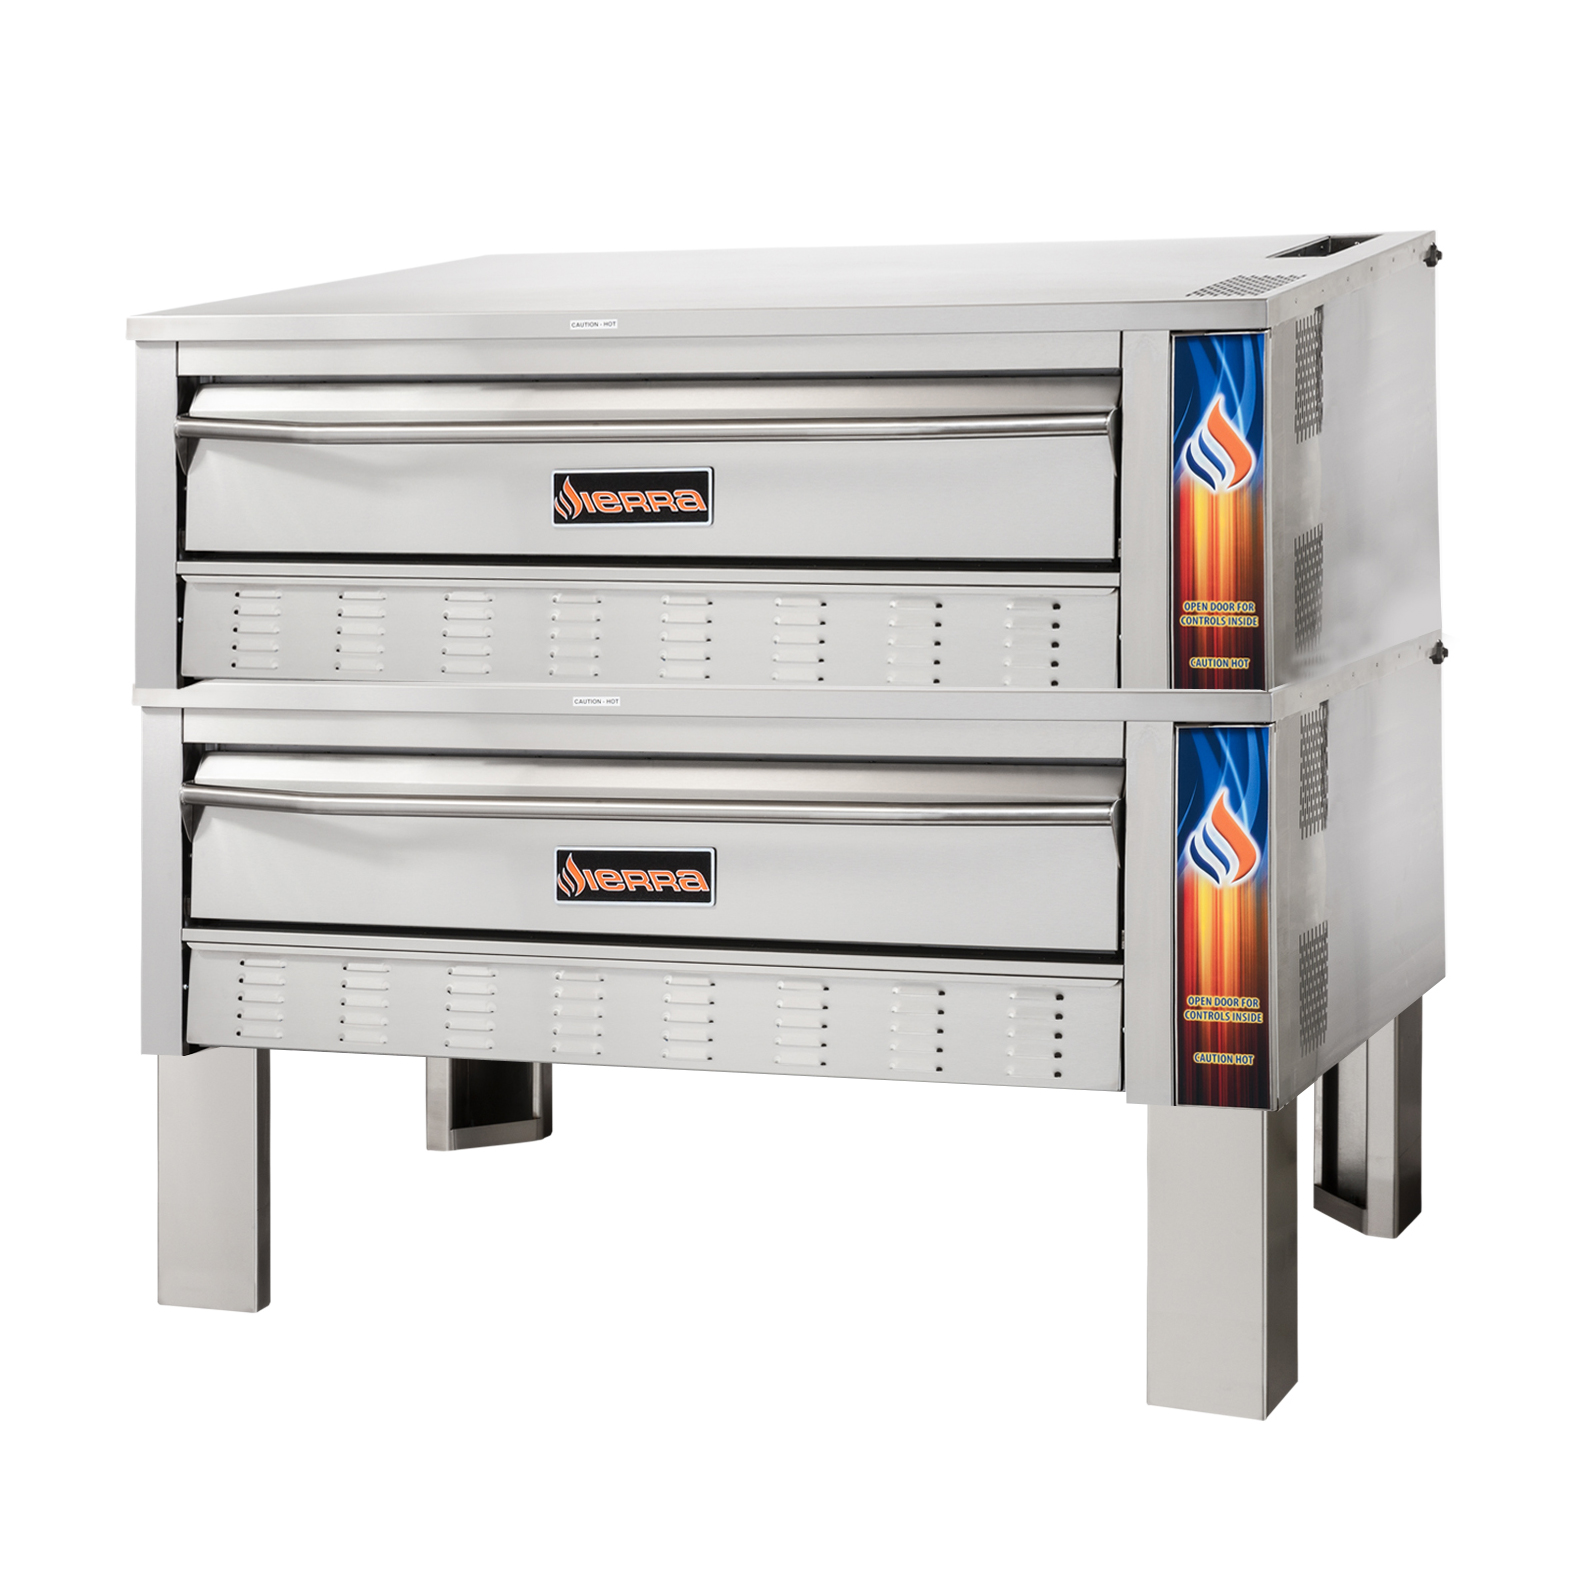 MVP SRPO-48G-2 pizza bake oven, deck-type, gas